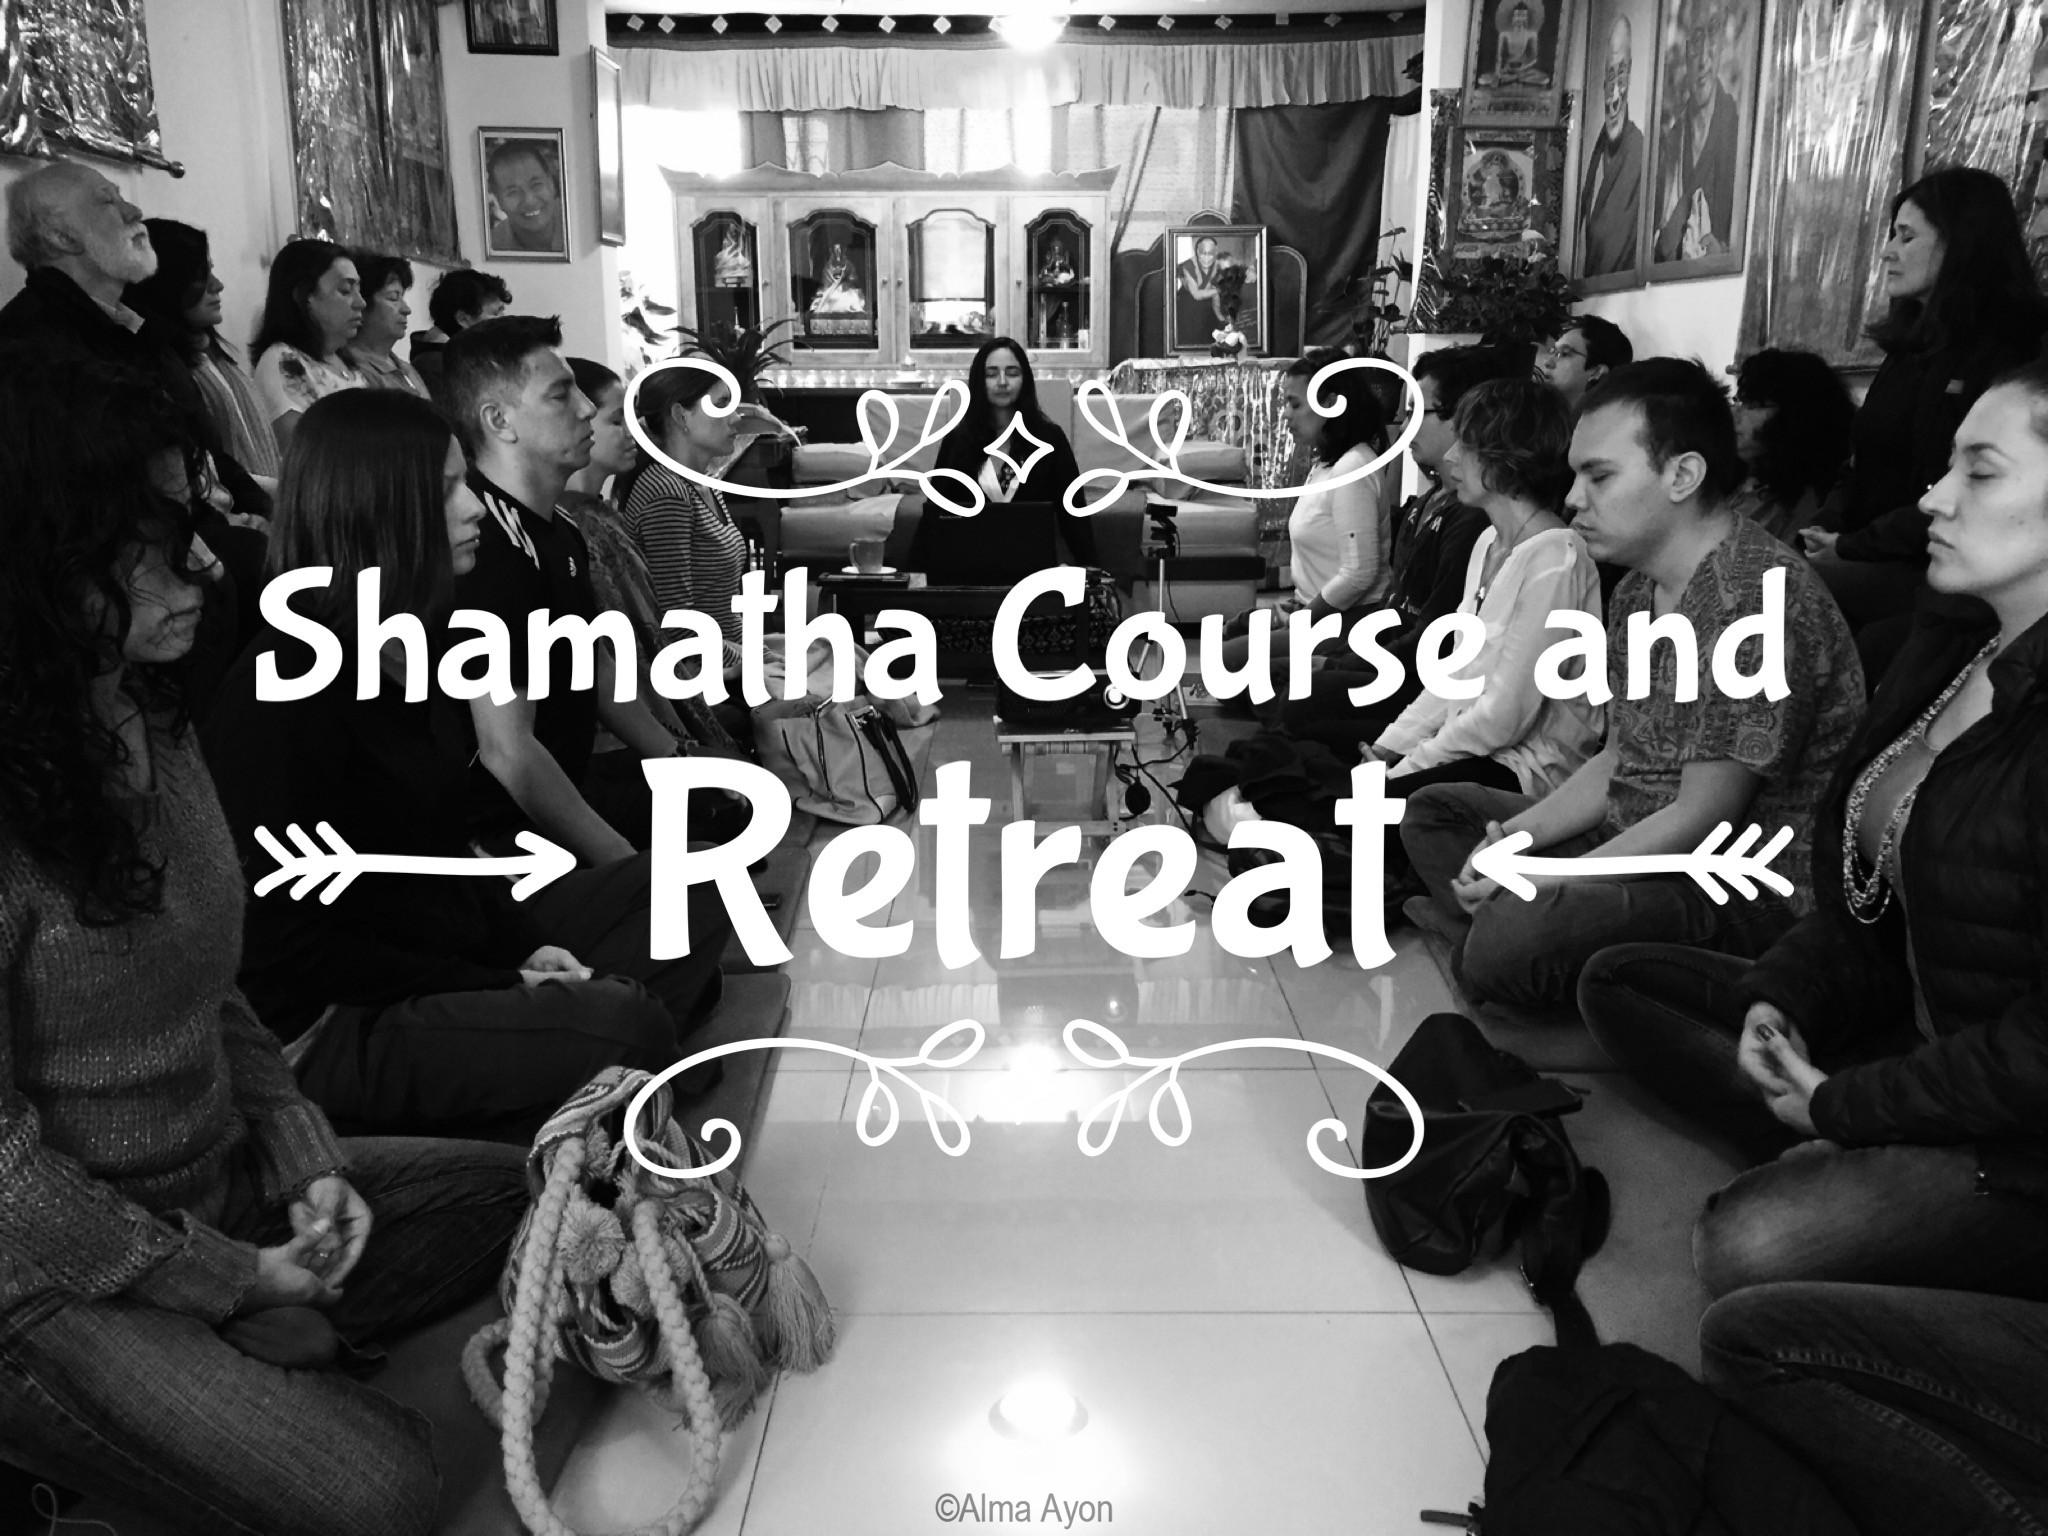 Shamatha Course and Retreat